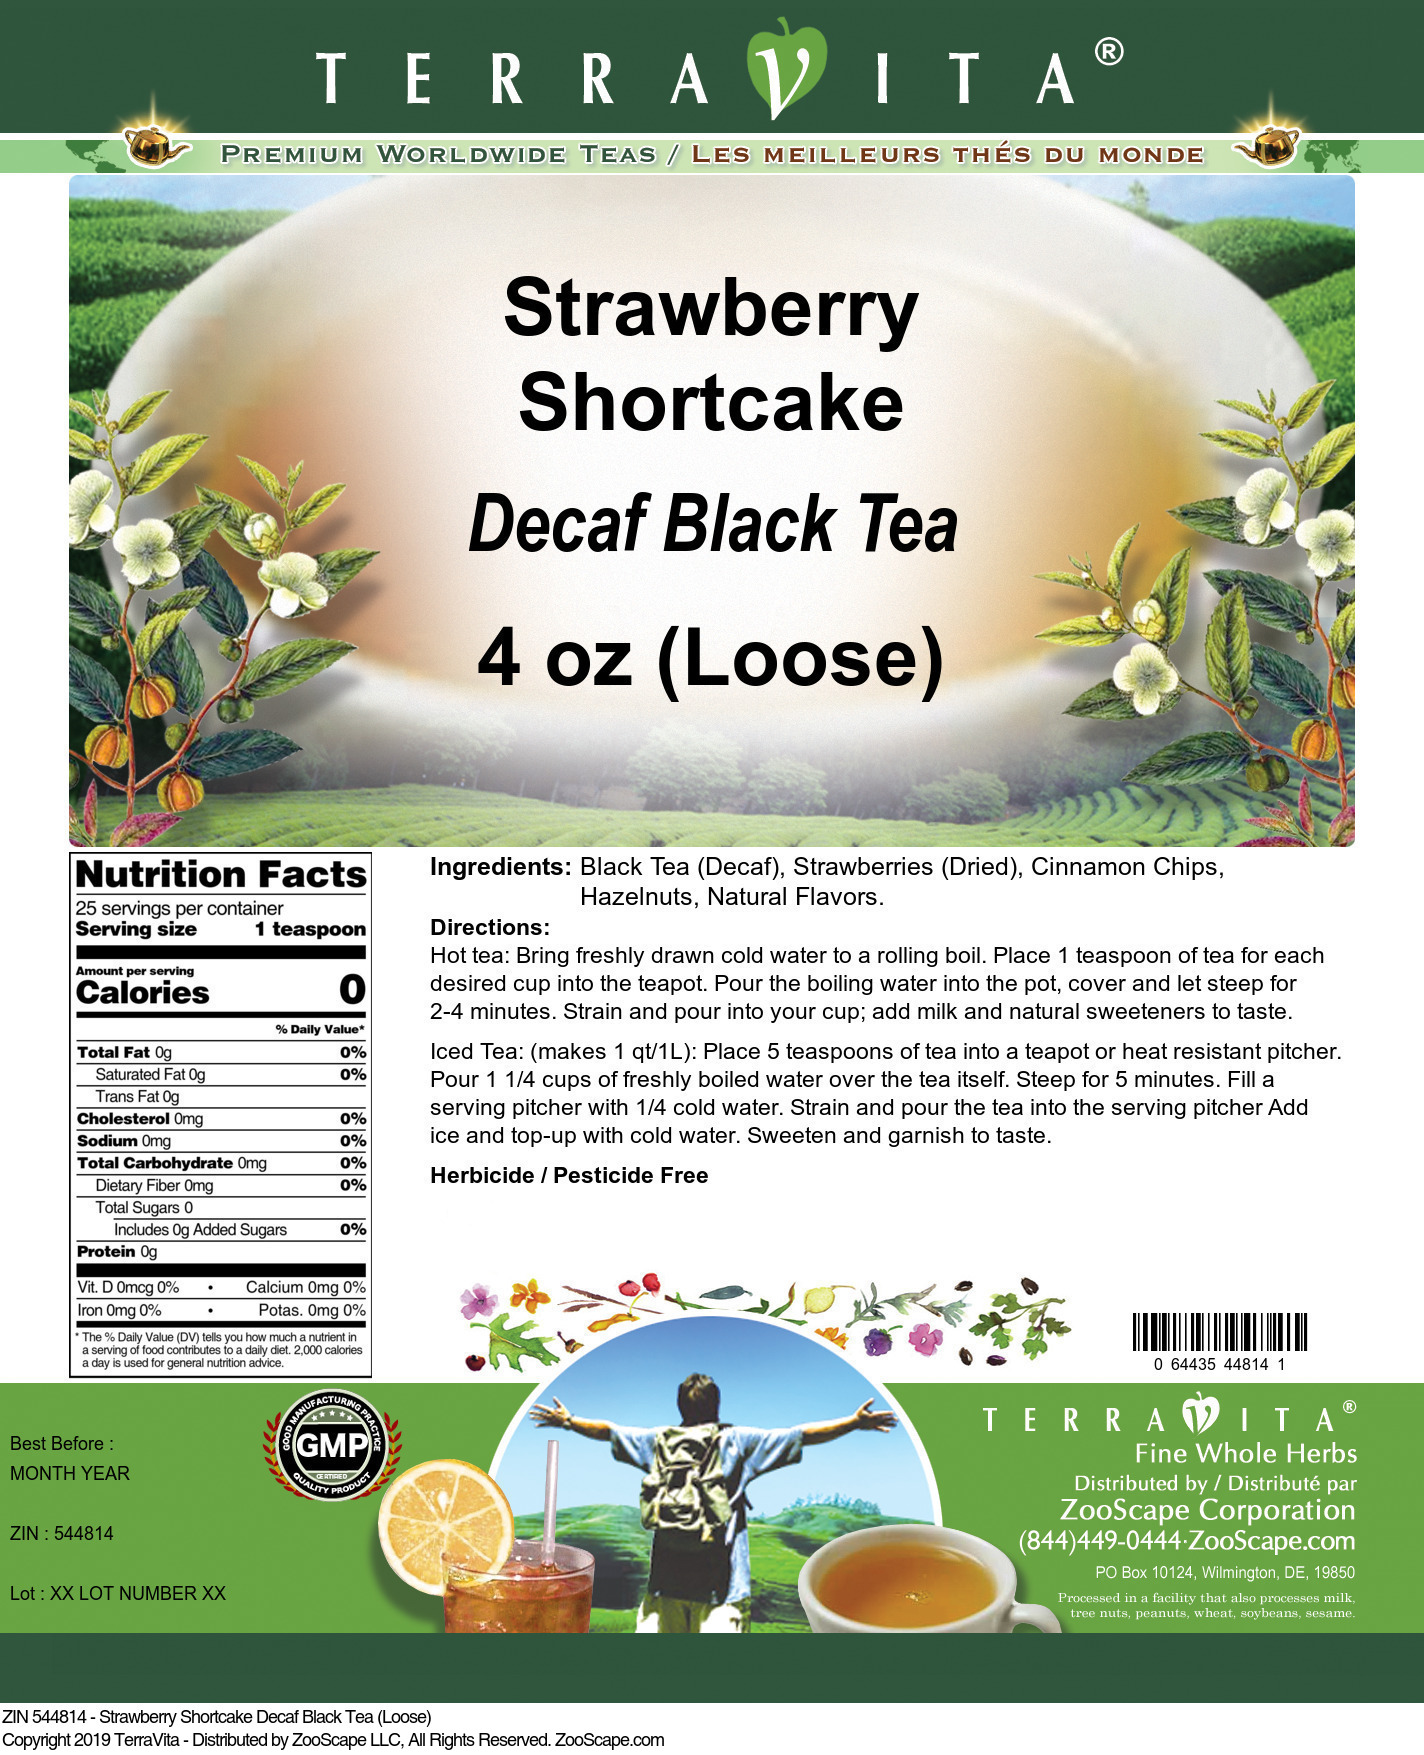 Strawberry Shortcake Decaf Black Tea (Loose)